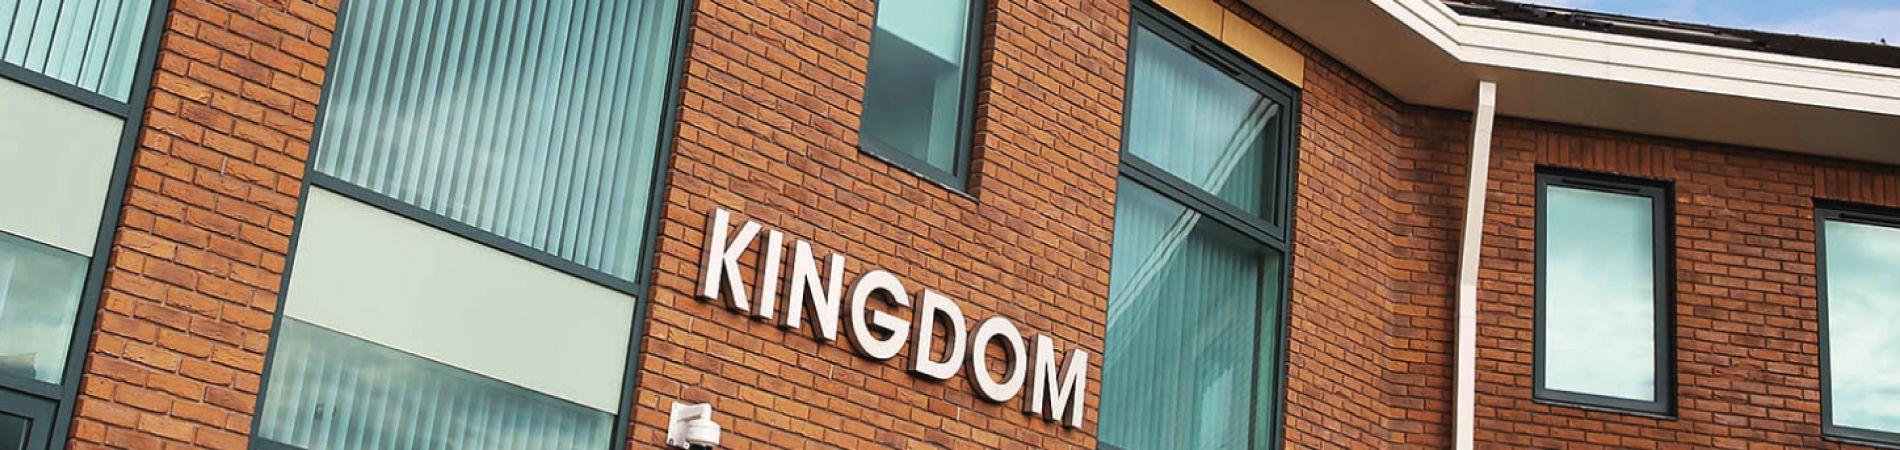 Kingdom-building-1